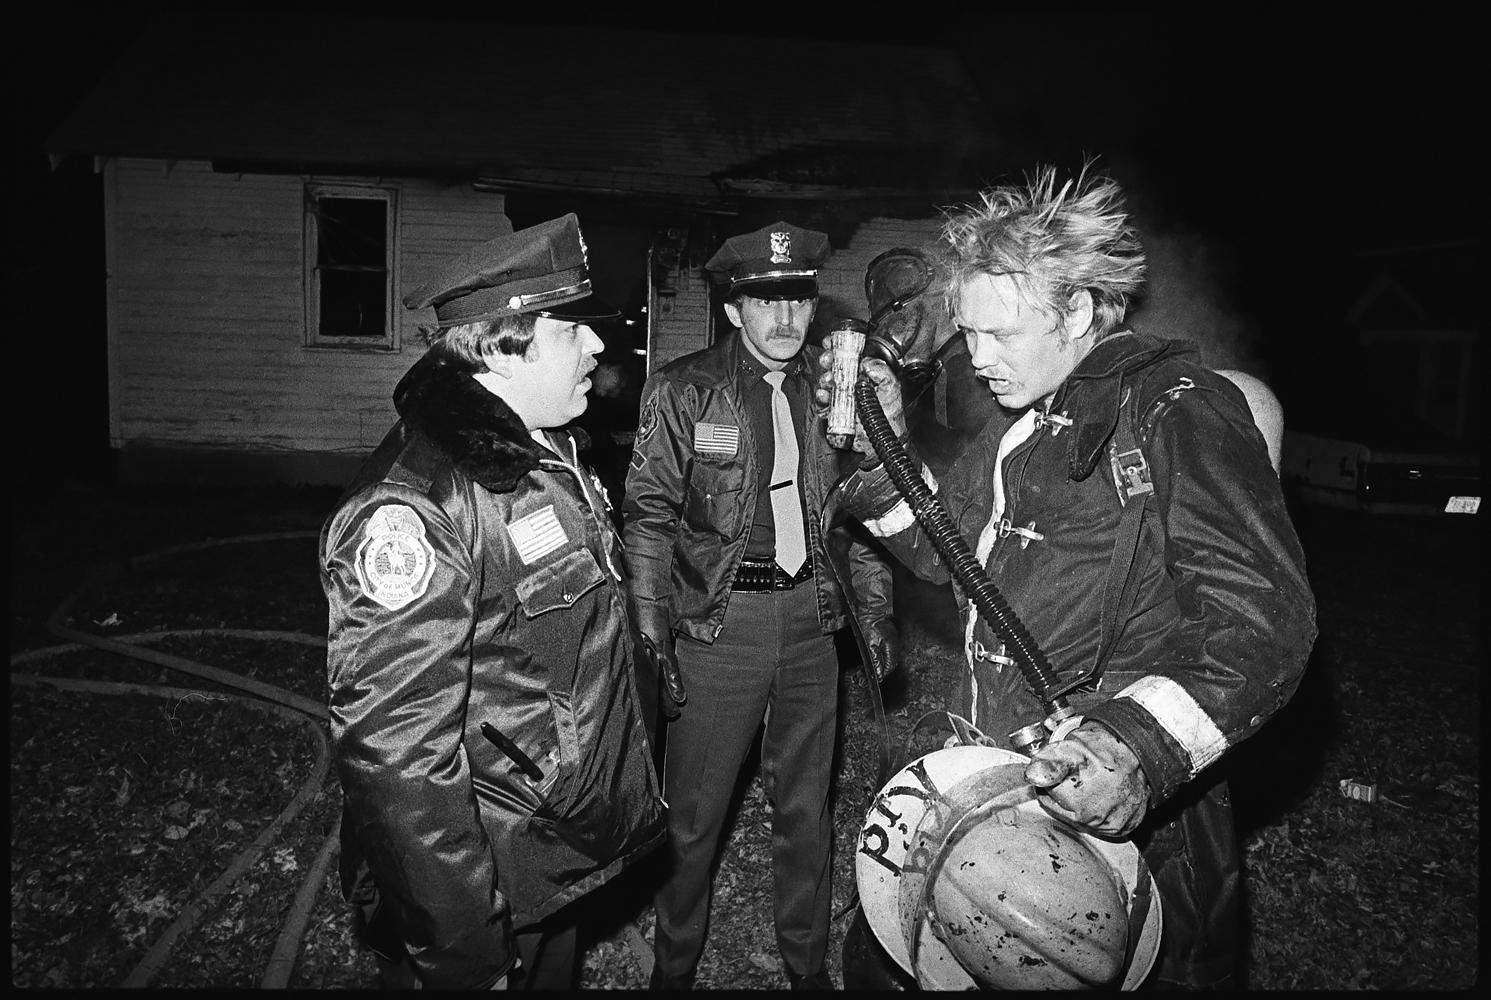 20180119-TC-1982-Muncie_Police_Story-088.jpg